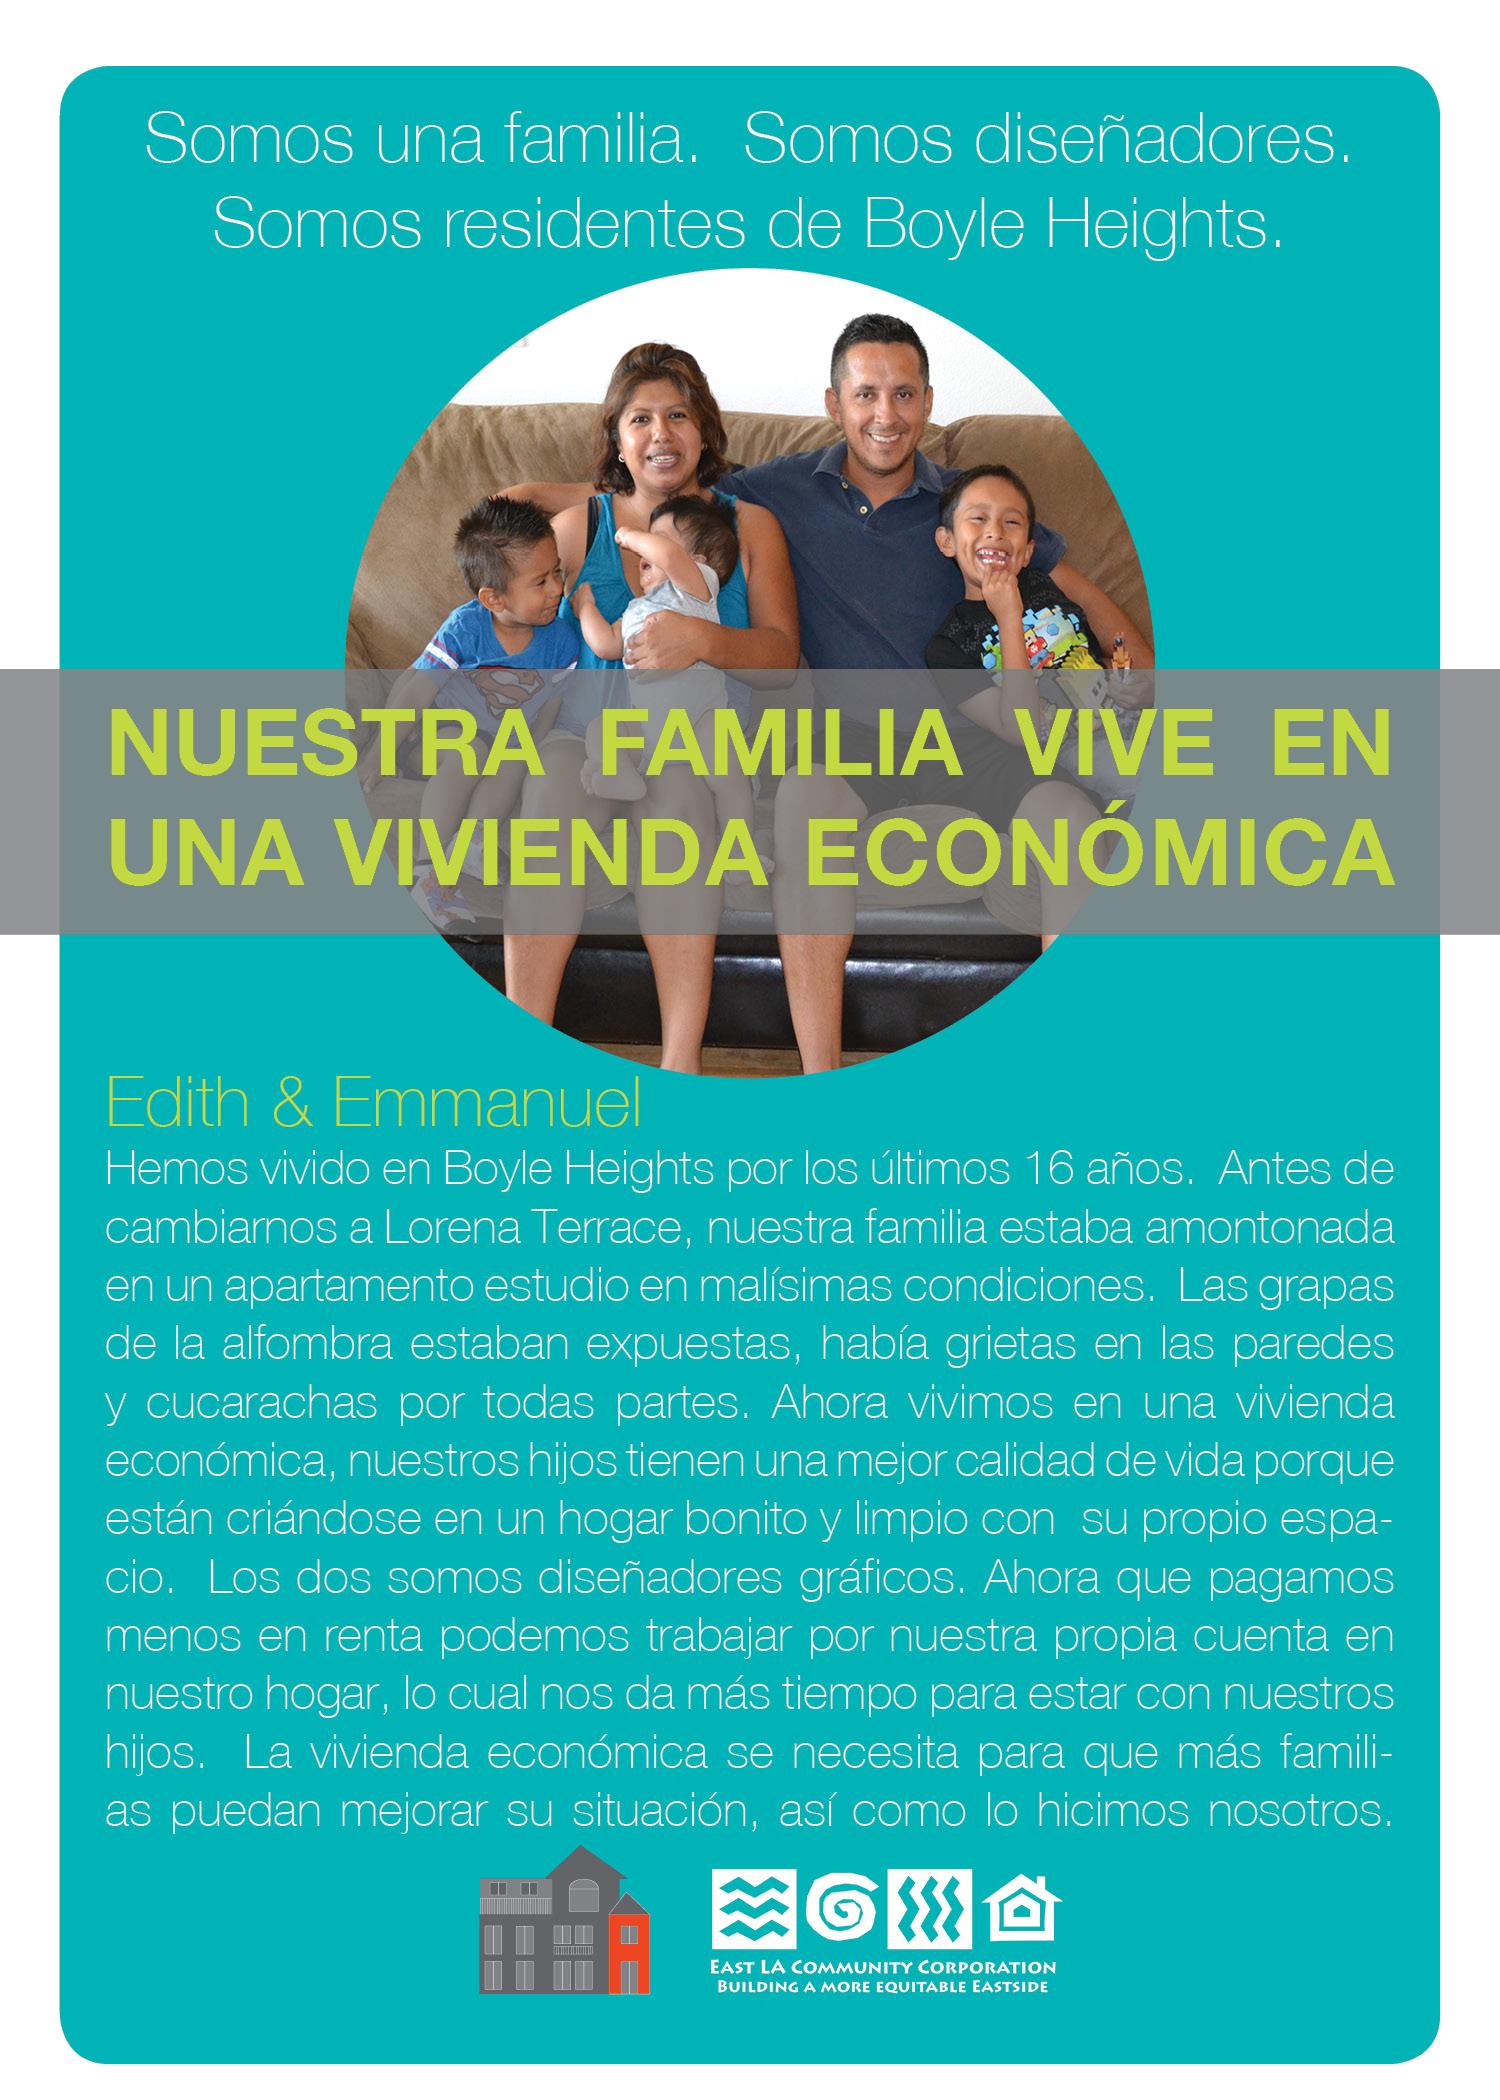 SPANISH_Live_in_Affordable_Housing-Edith_Emmanuel-_JPEG.jpg